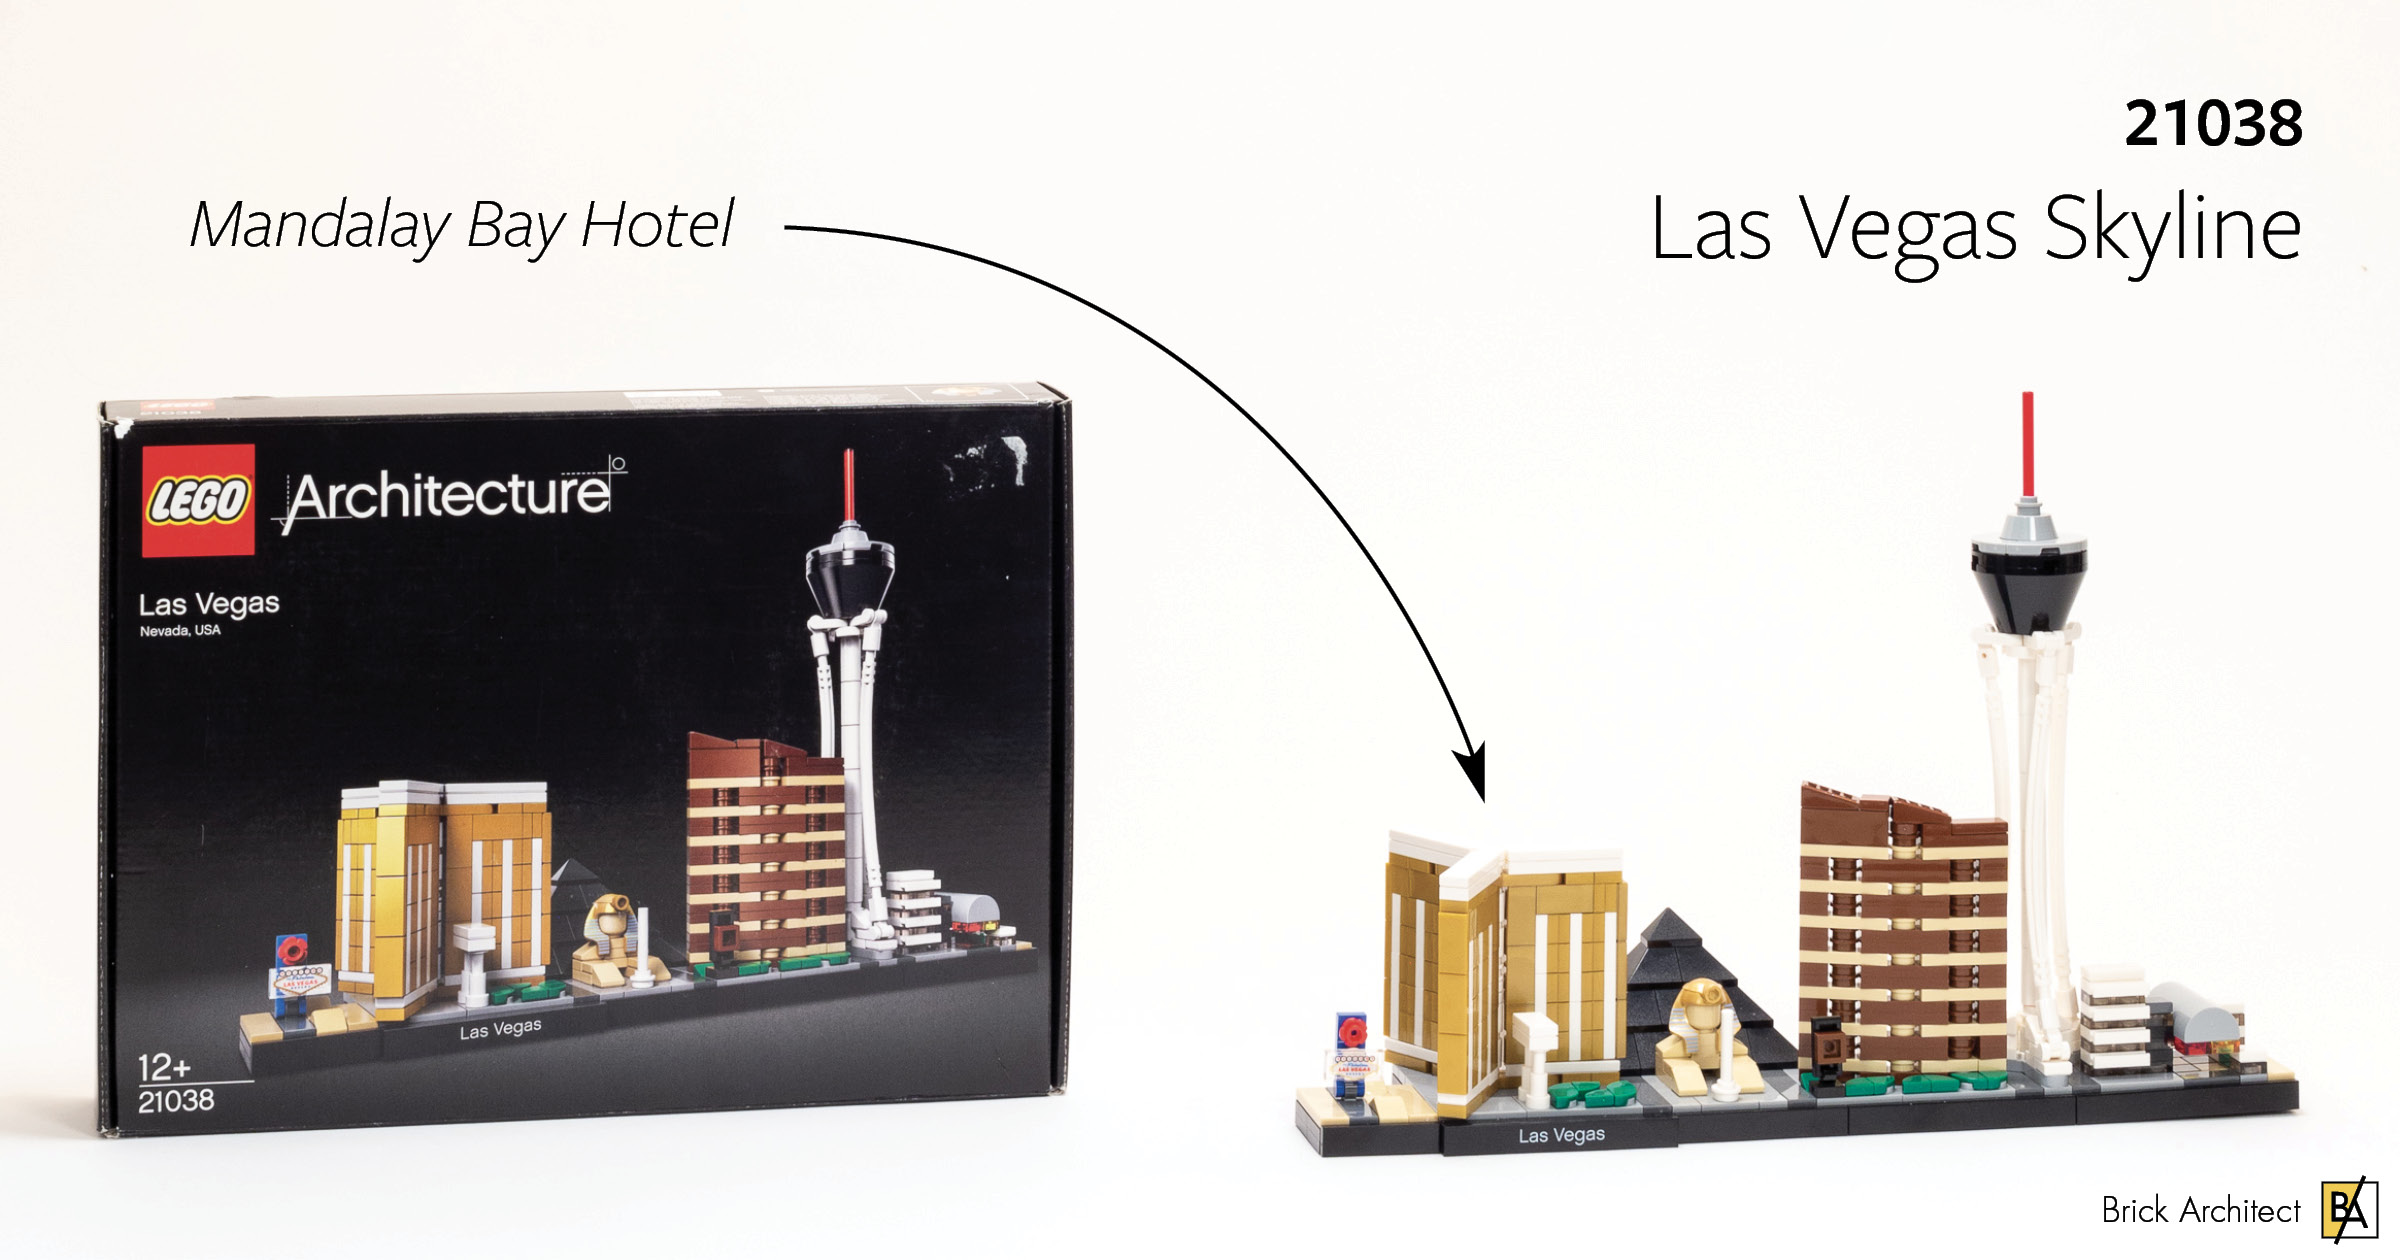 ʀᴇᴠɪᴇᴡ: #21038 Las Vegas Skyline (with Mandalay Bay